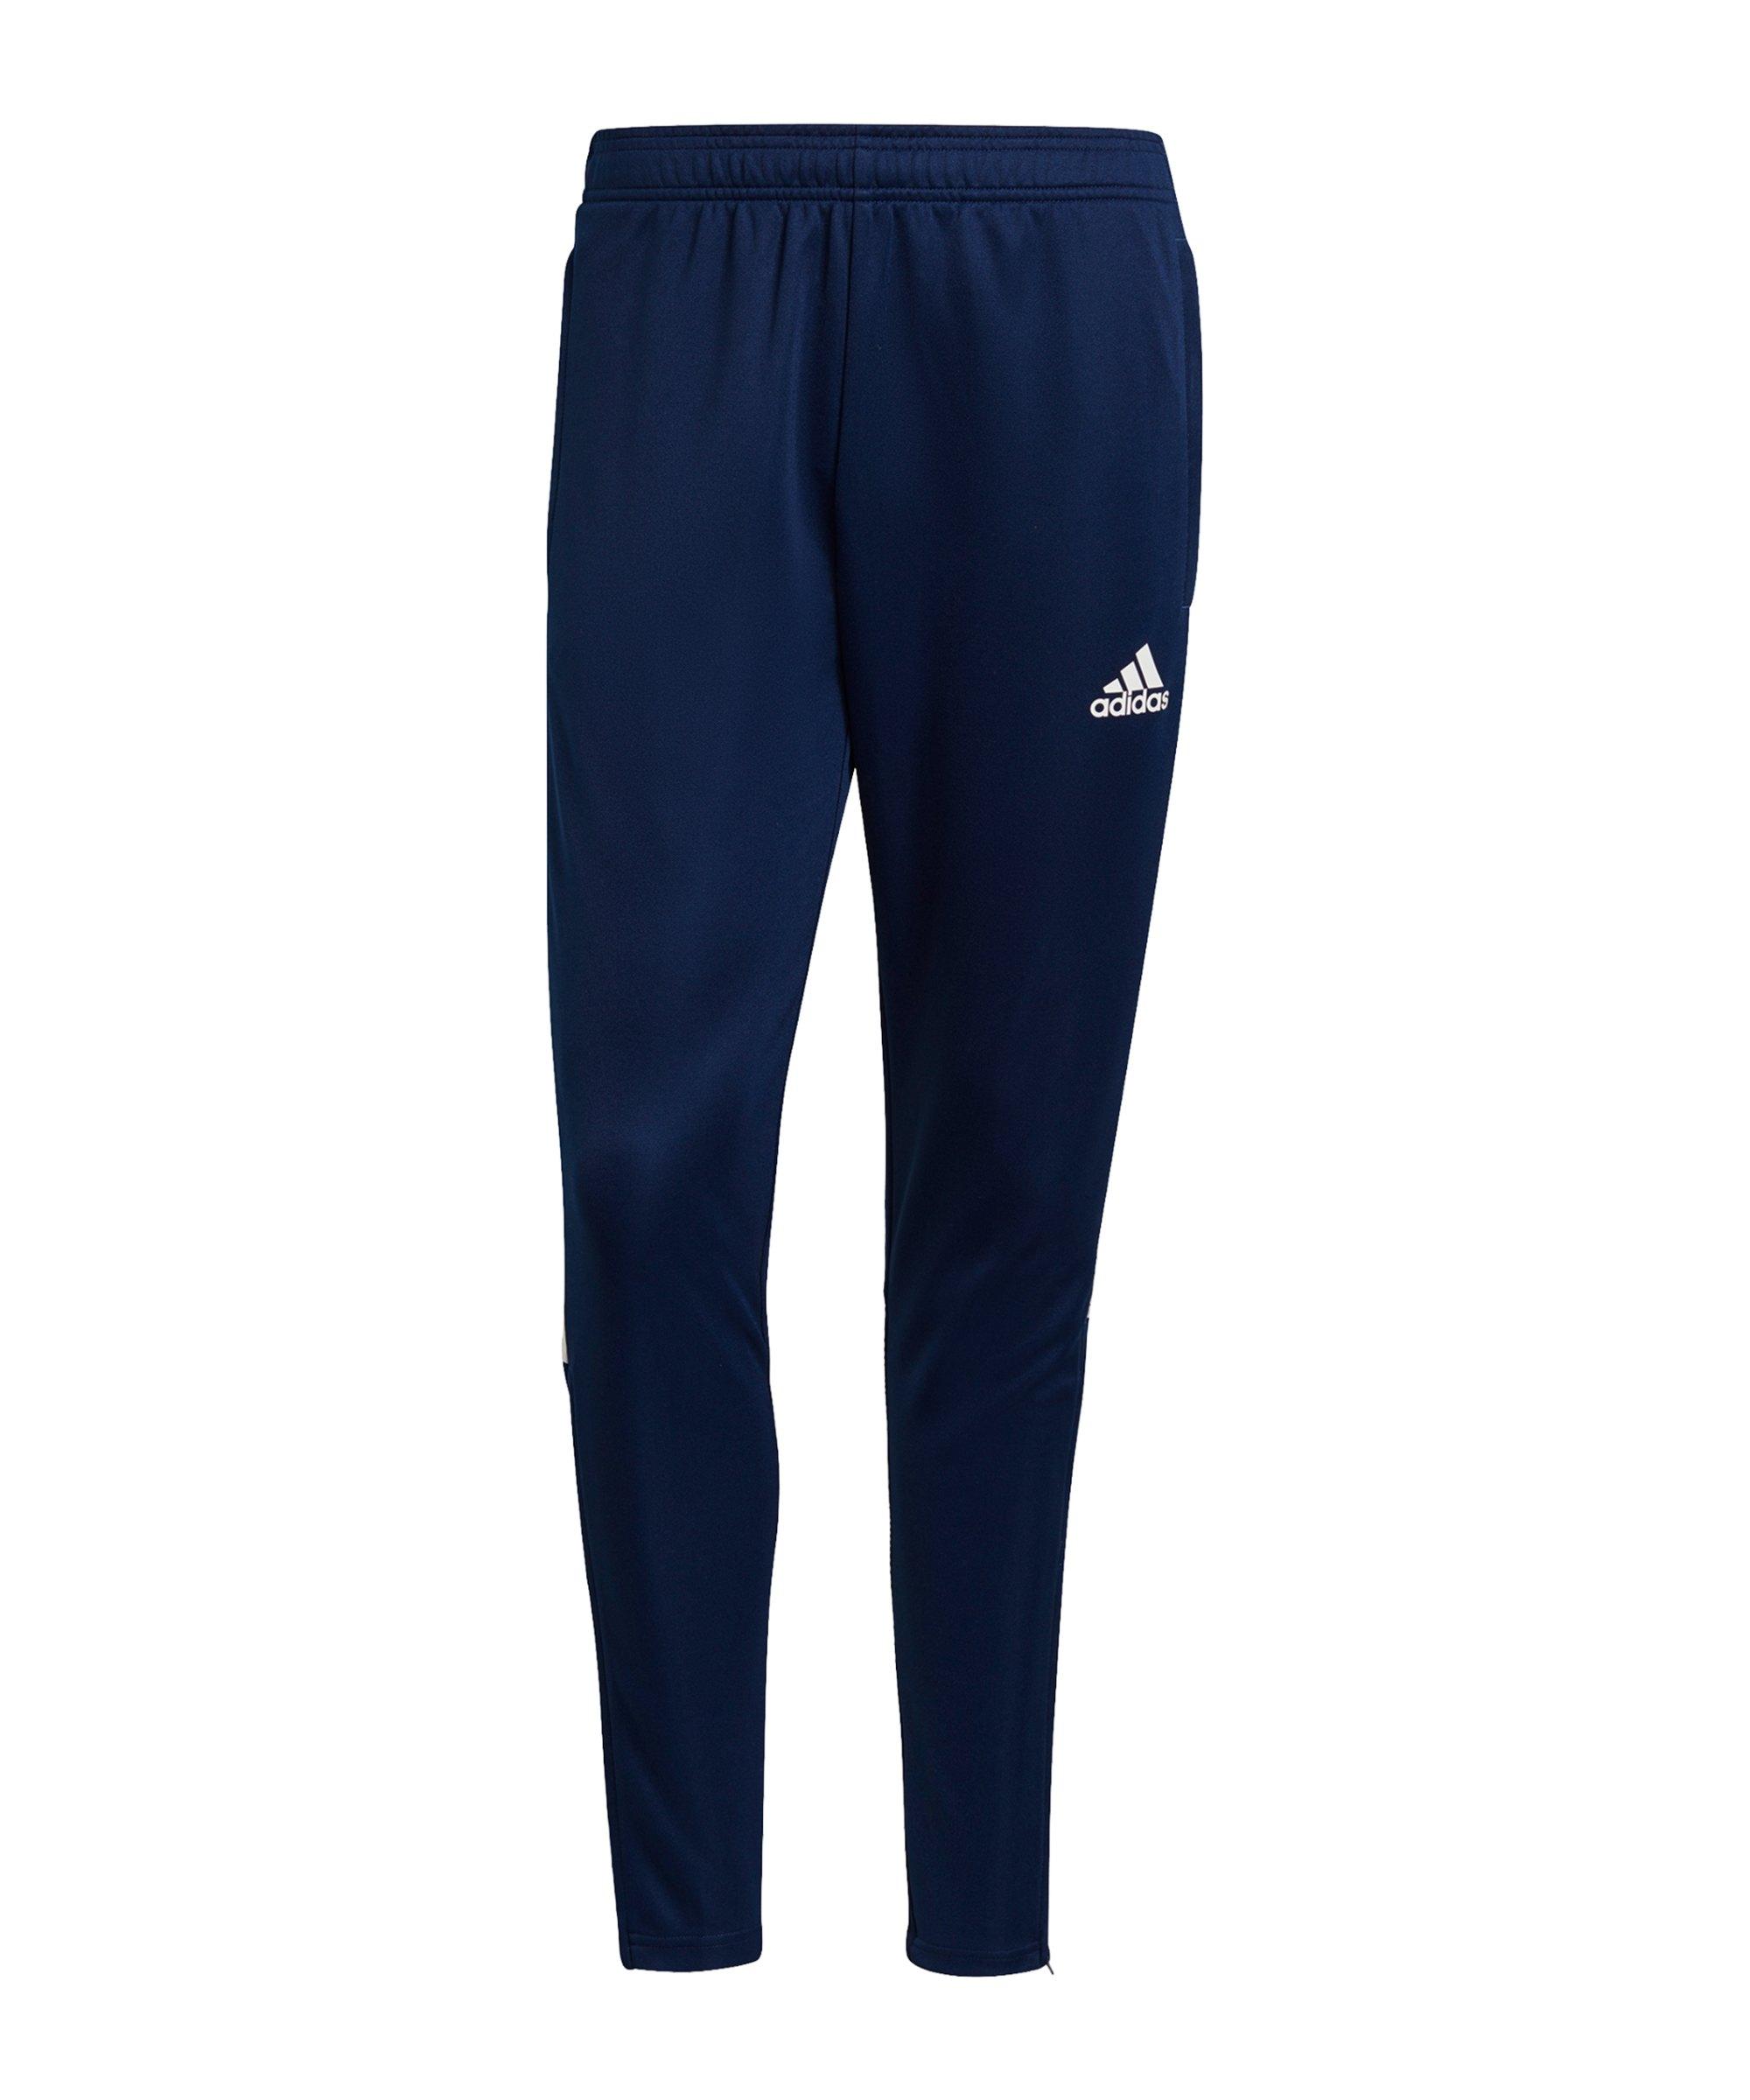 adidas Tiro 21 Trainingshose Blau Weiss - blau